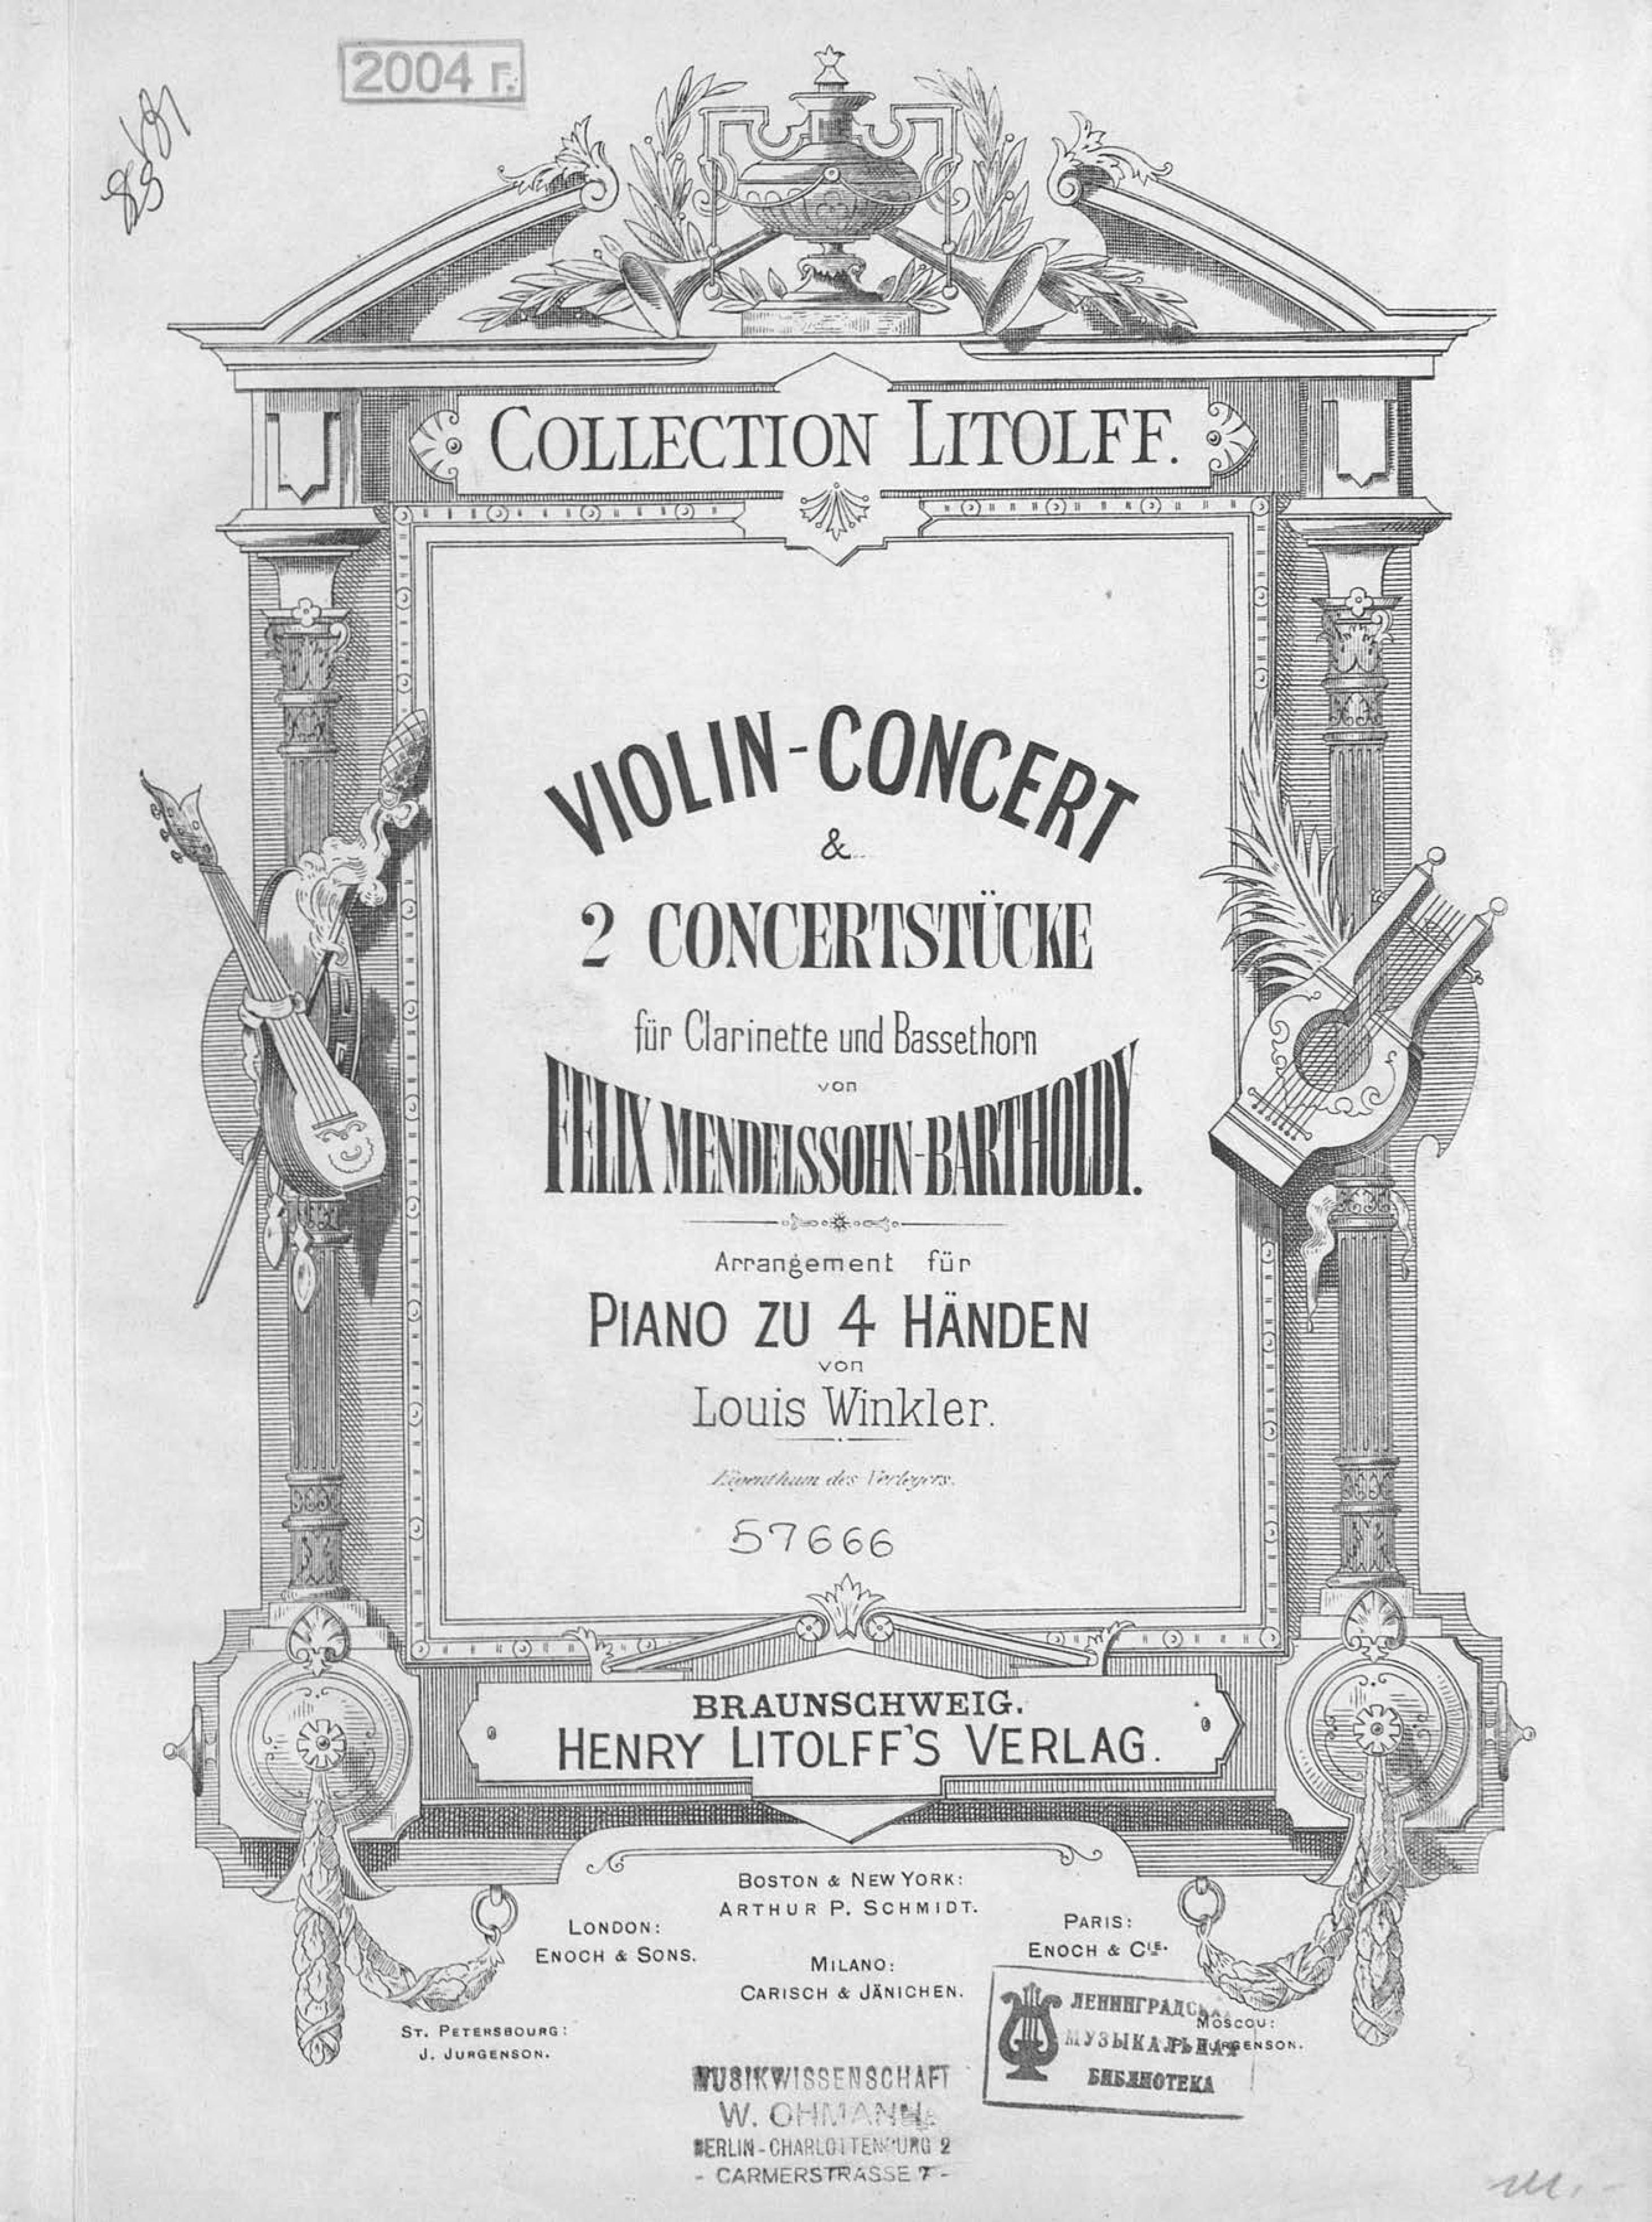 Феликс Мендельсон-Бартольди Violin-Concert & 2 Concertstucke fur Clarinette und Bassethorn v. F. Mendelssohn-Bartholdy